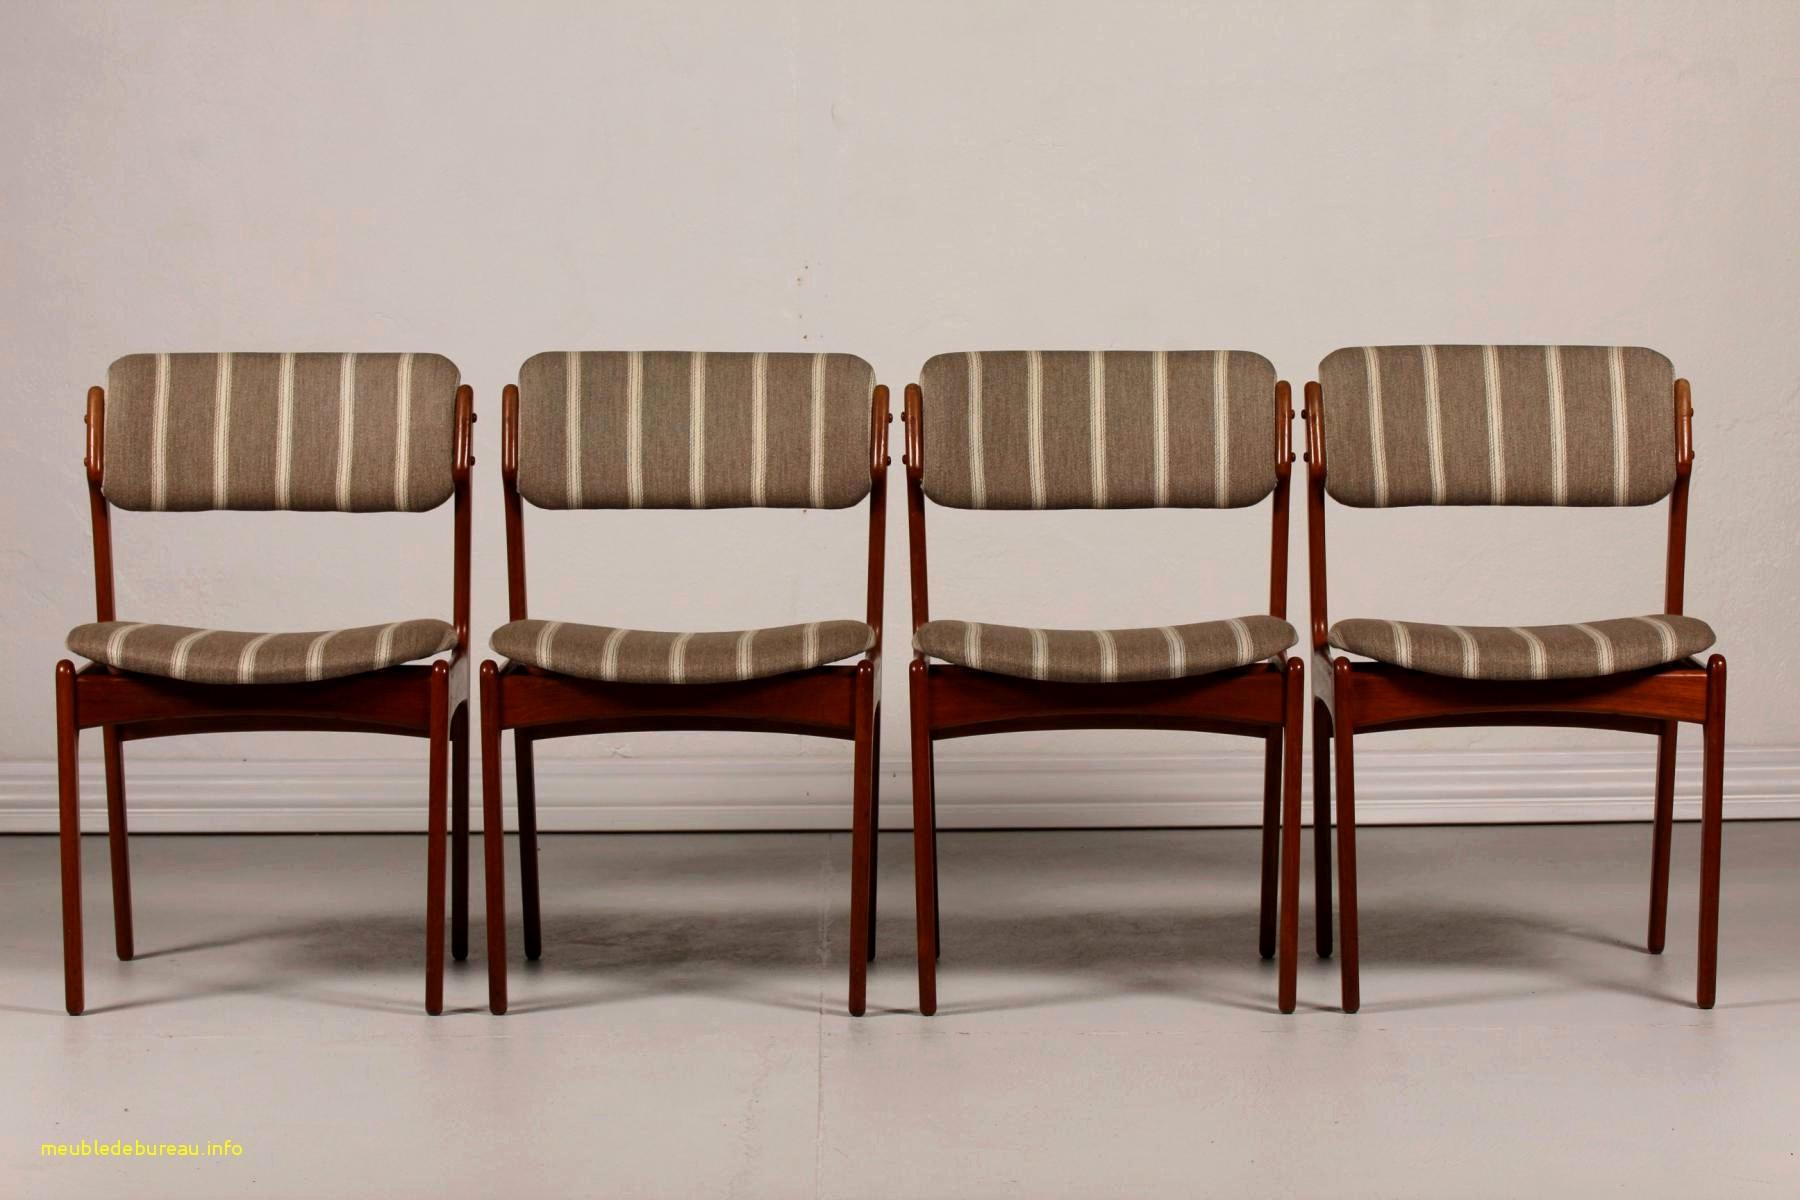 fauteuil rotin pas cher beau chaise en rotin pas cher chaise bistrot rotin pas cher 83 chaise of fauteuil rotin pas cher